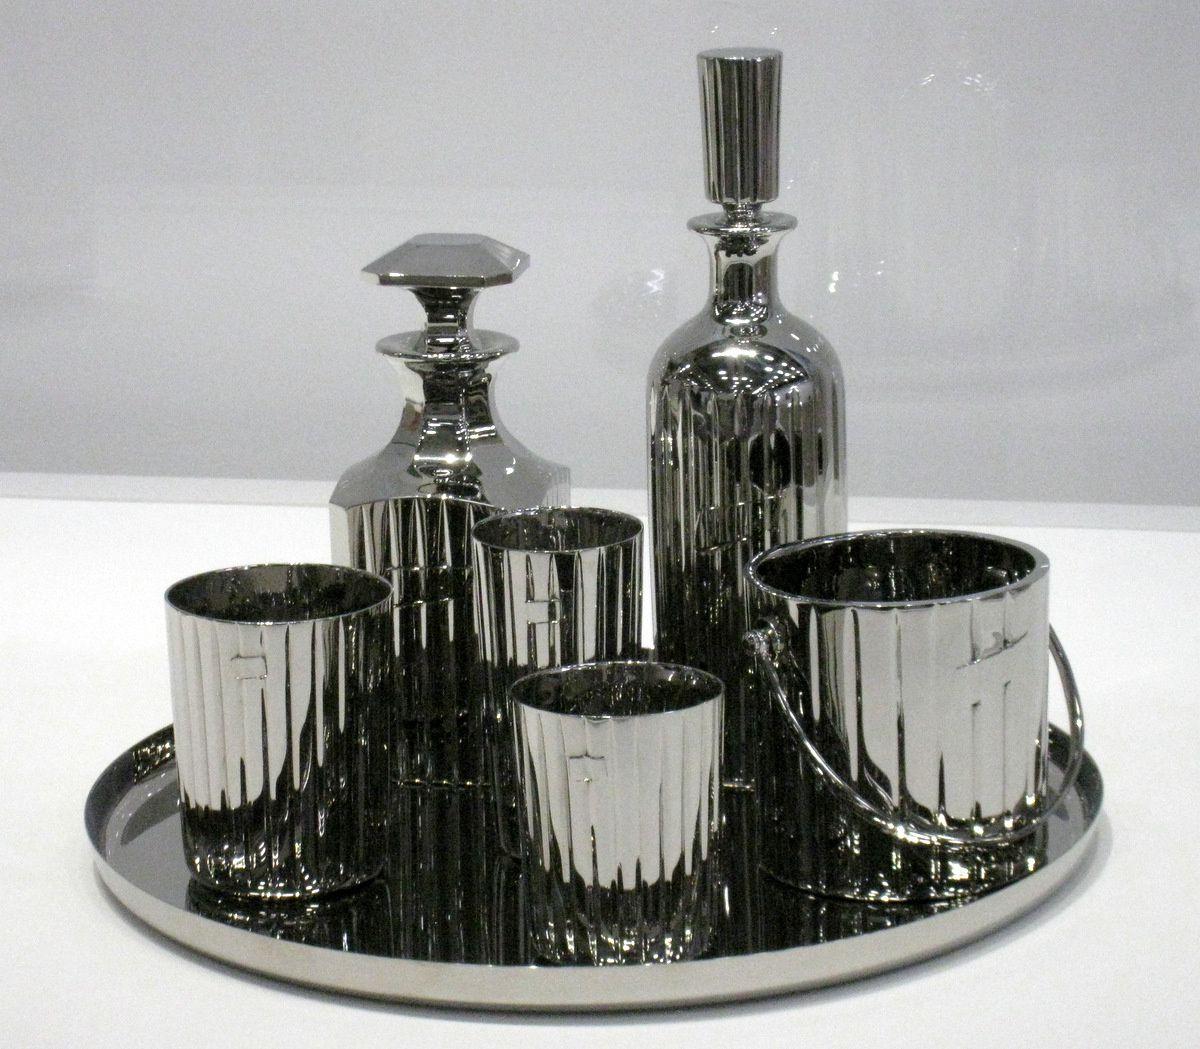 Luxury and Degradation par Jeff Koons